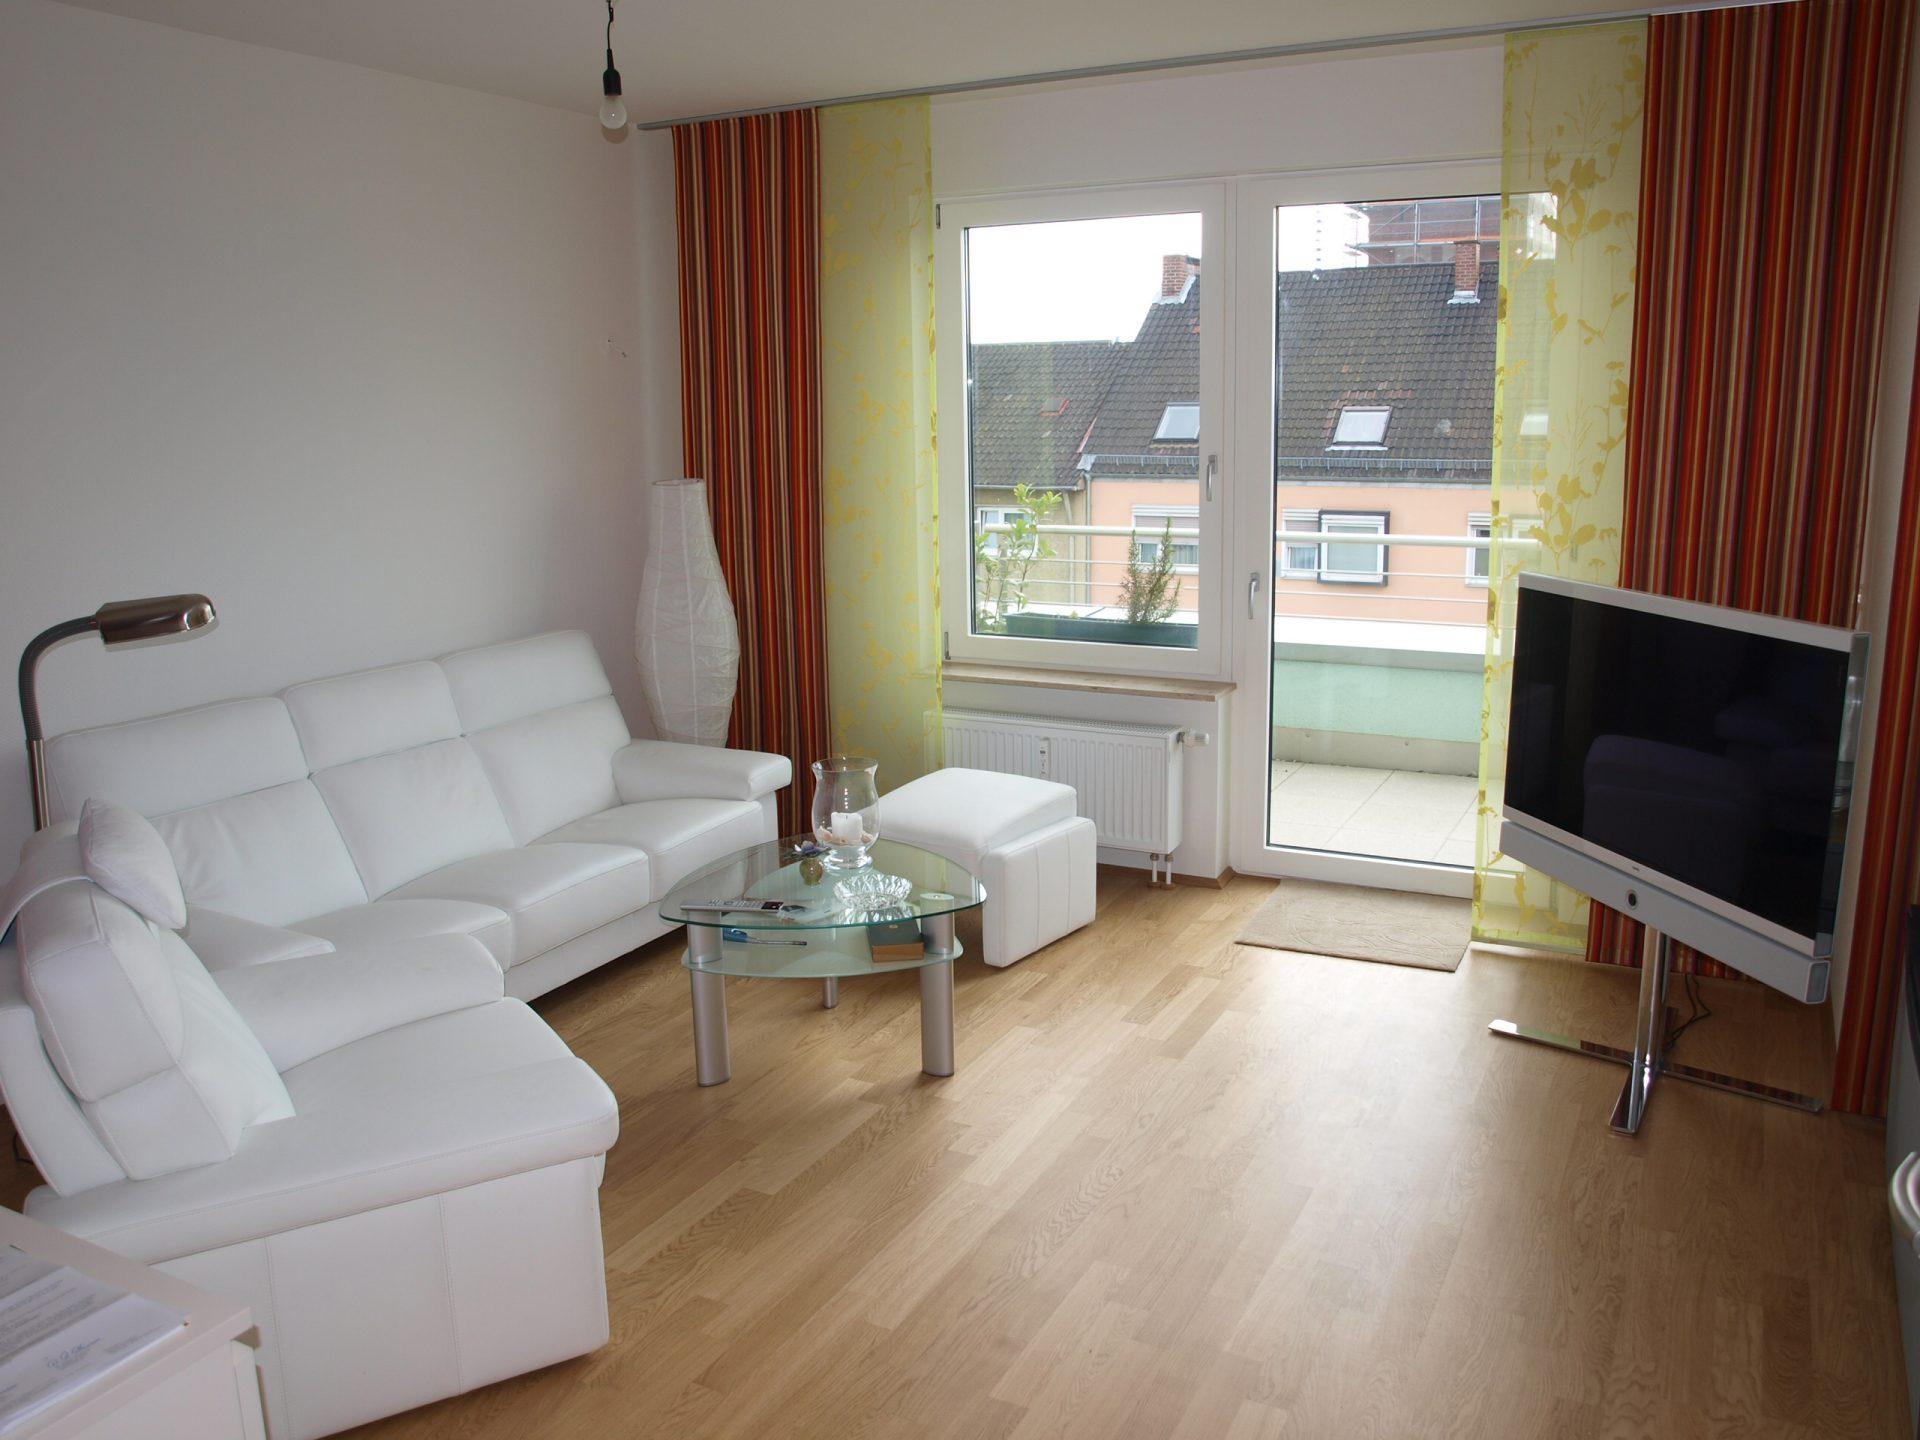 mannheim lindenhof lindenhofstr frei ab sofort. Black Bedroom Furniture Sets. Home Design Ideas